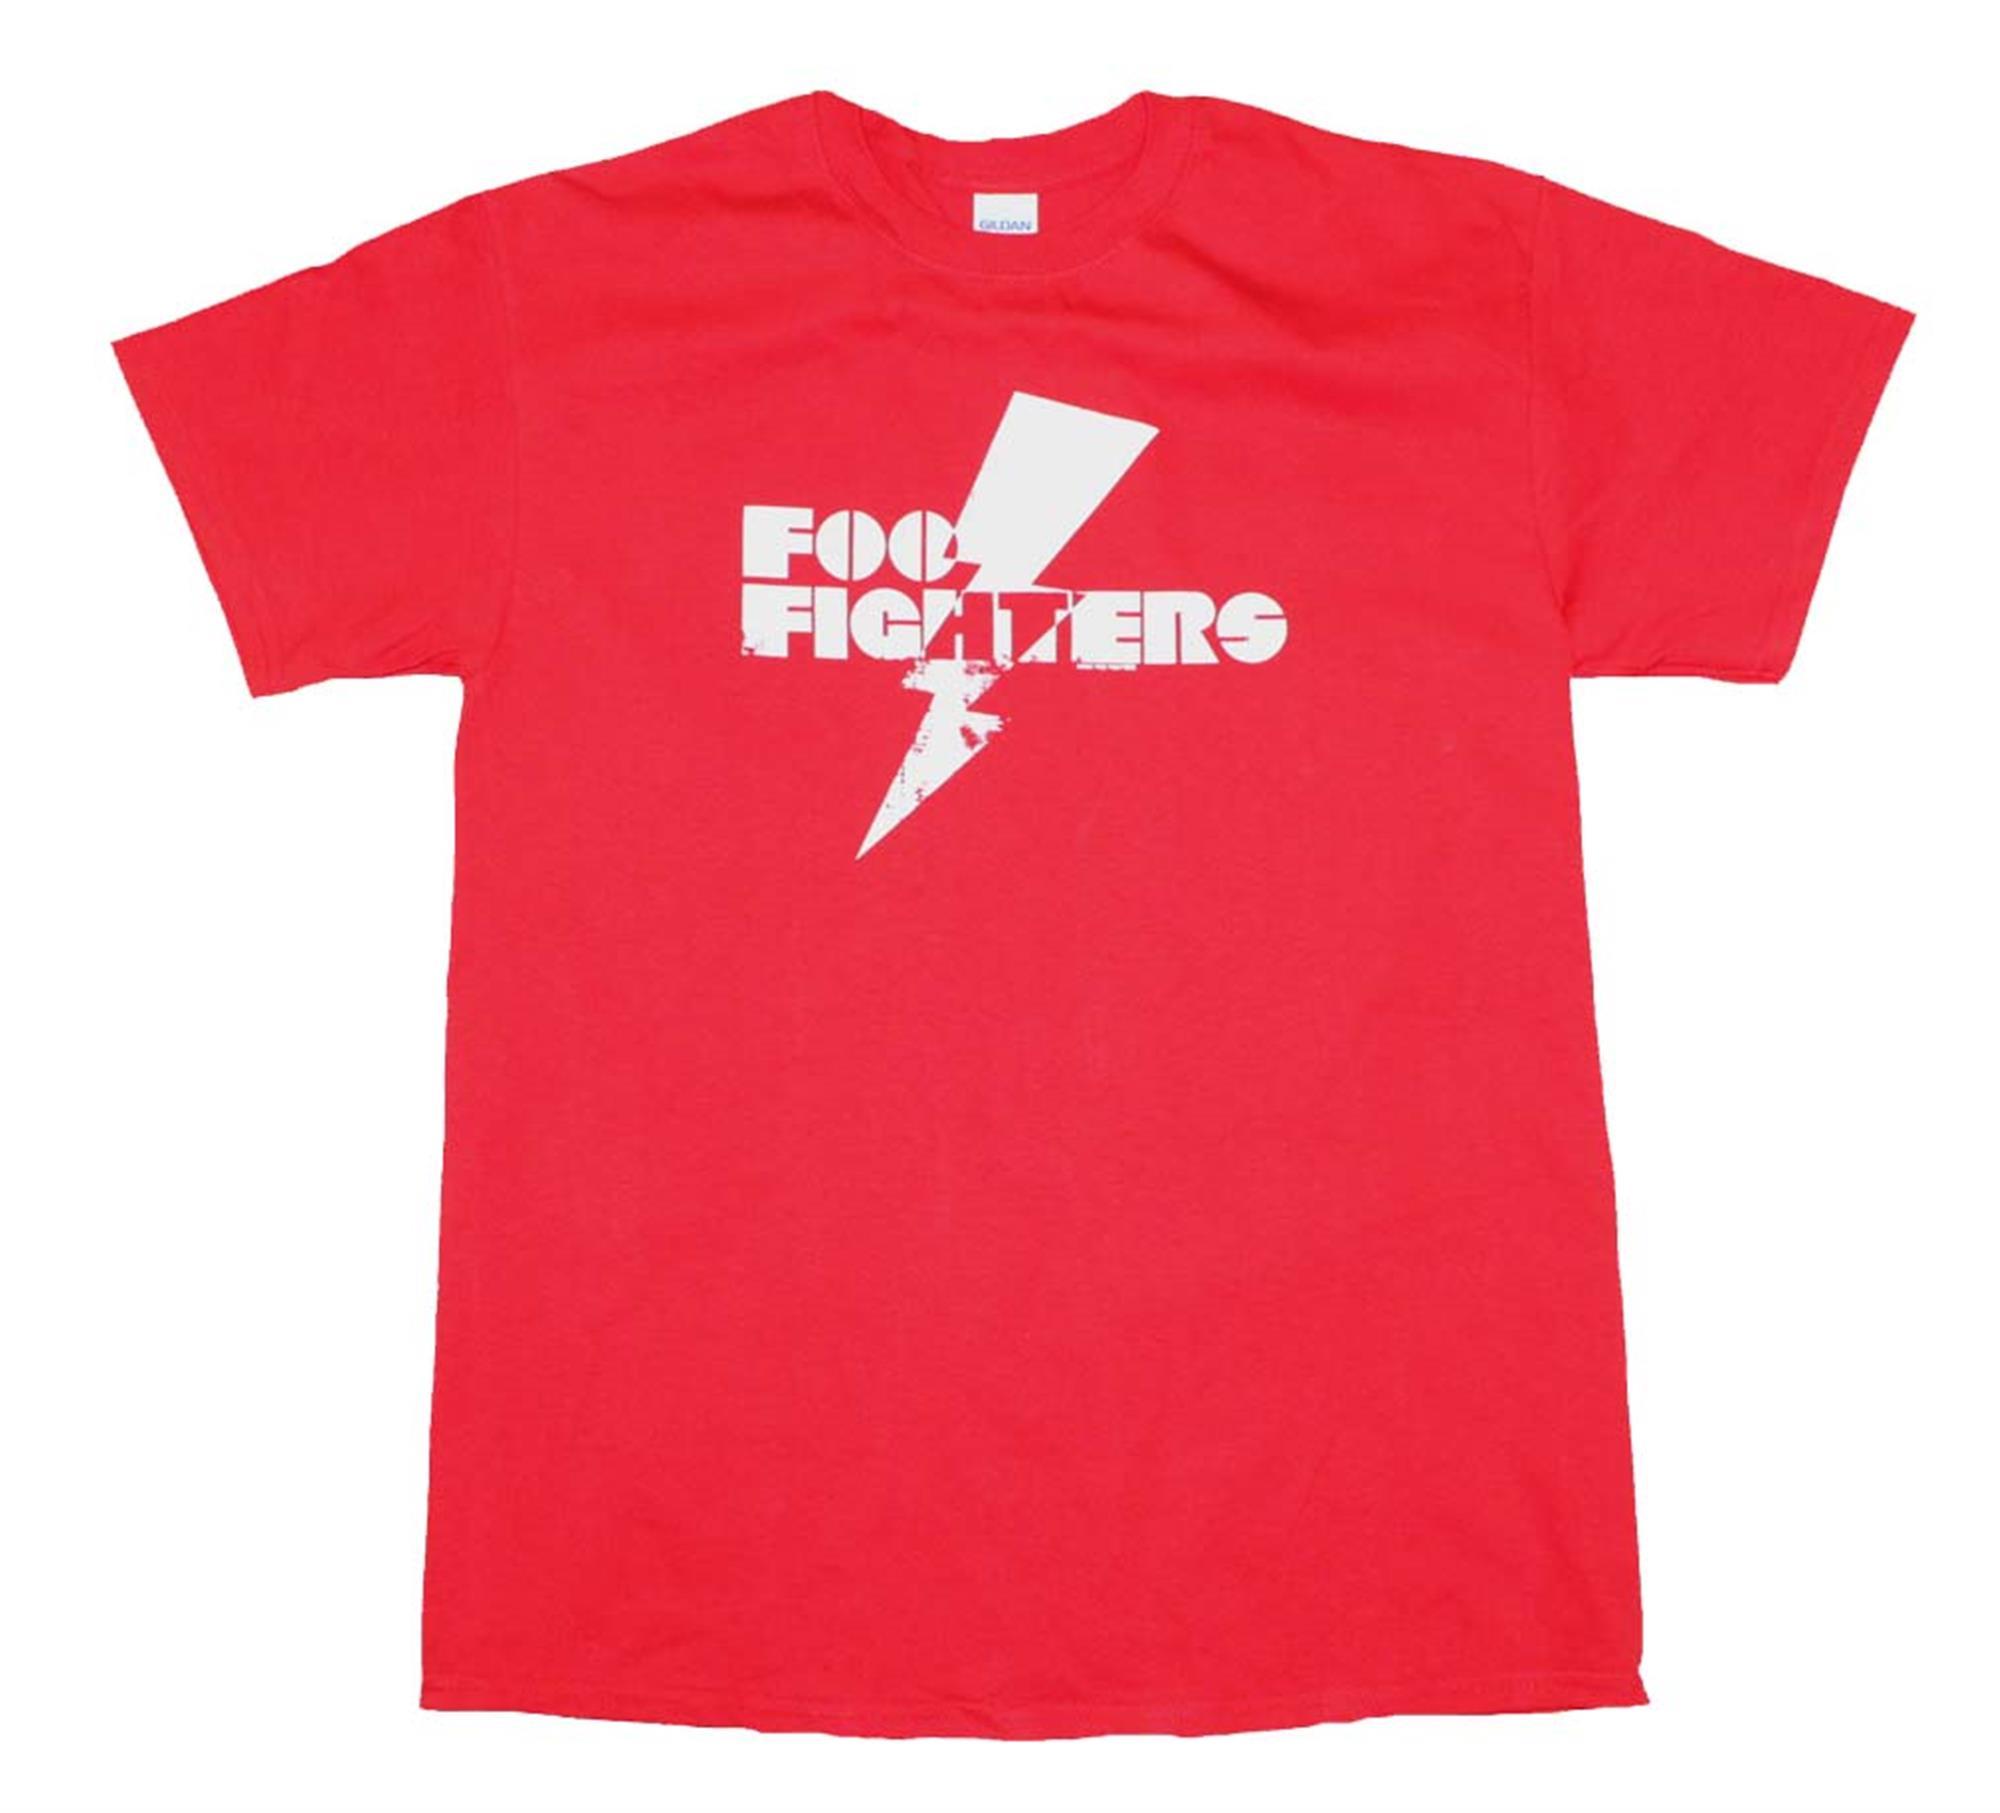 Foo Fighters Red Lightning T-Shirt